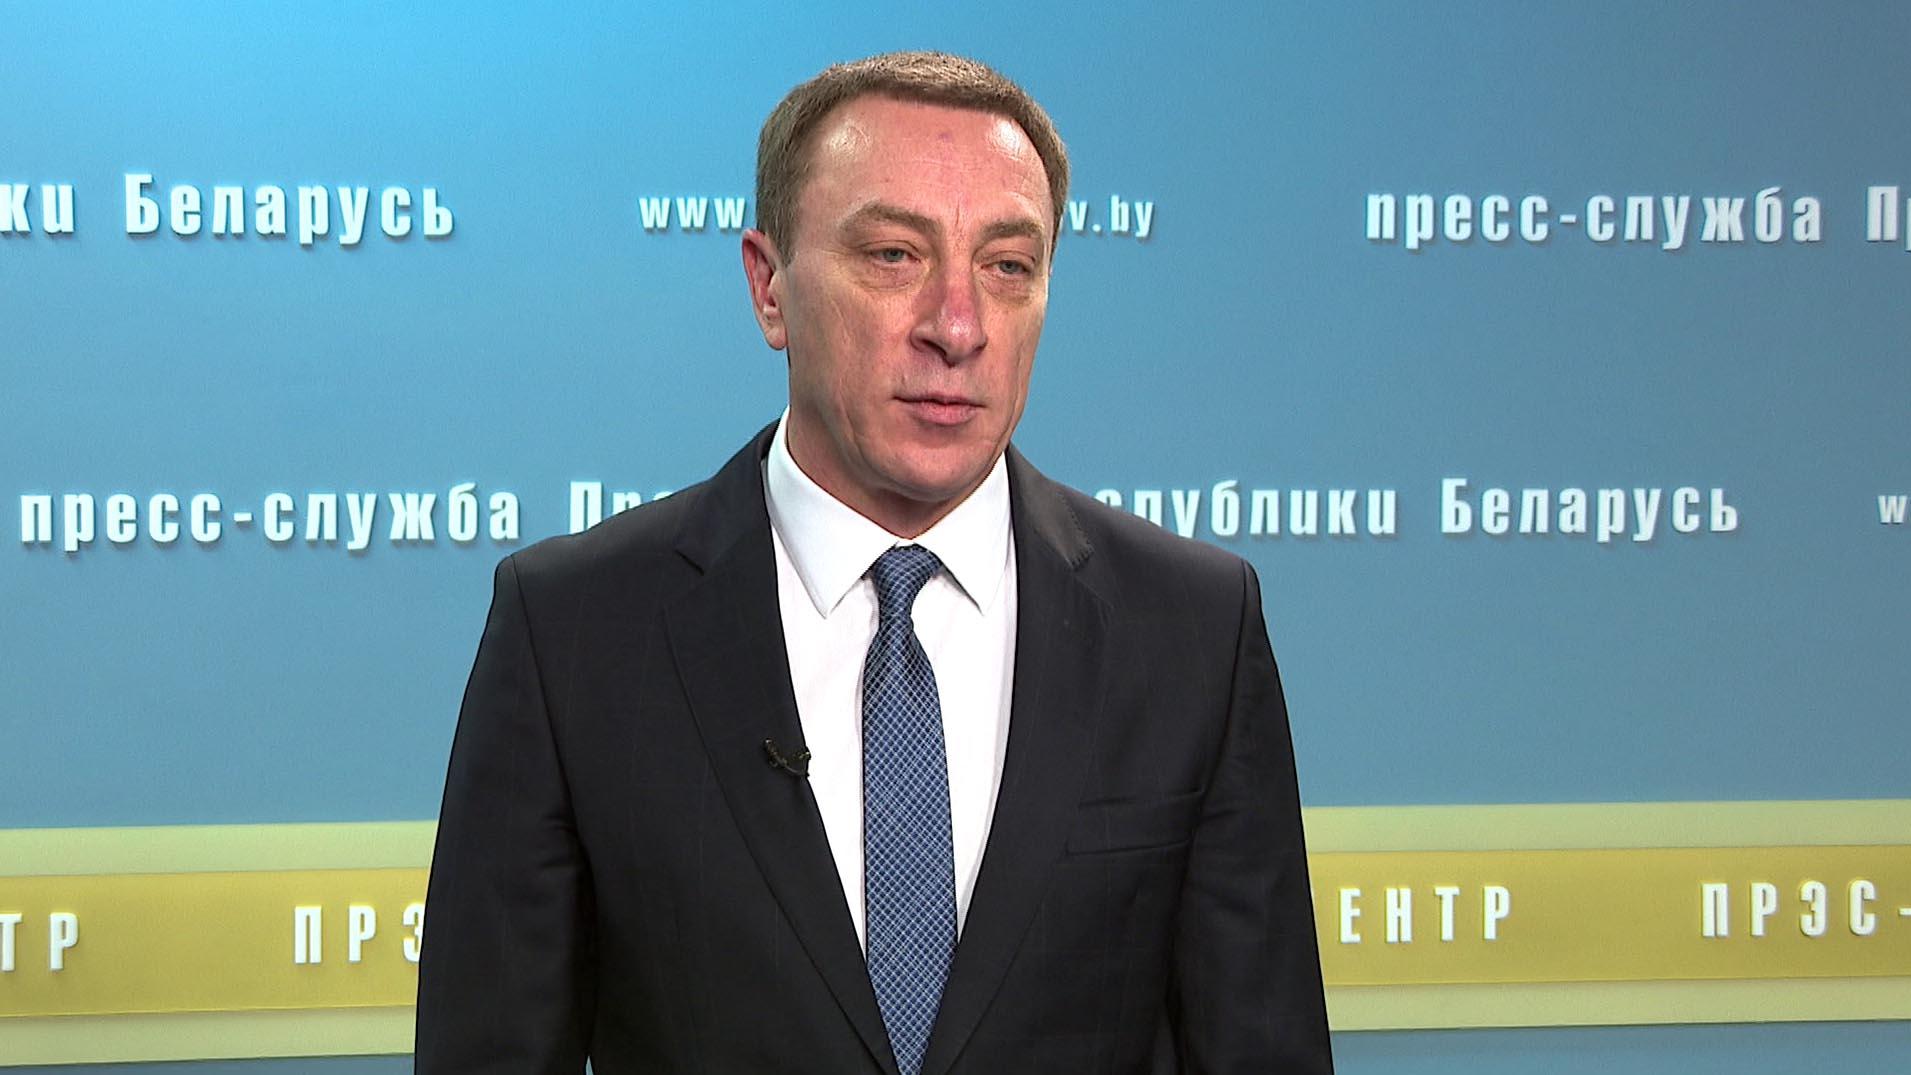 Власти Беларуси хотят усилить контроль за криптобиржами